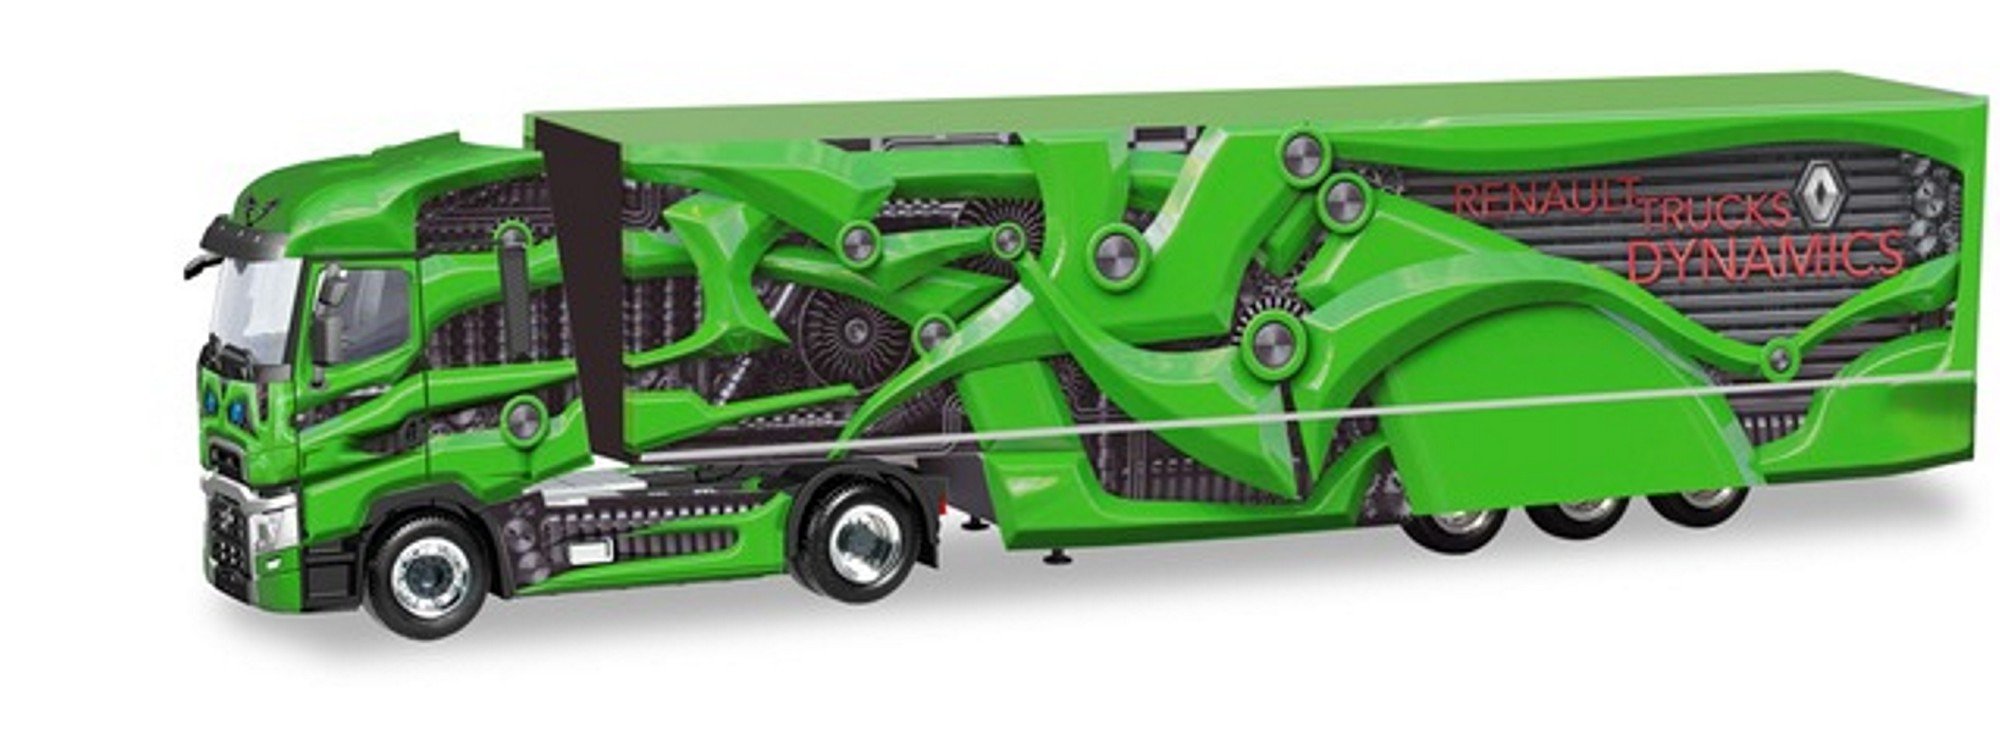 1:87 #310796 Herpa Renault Deutschland Promotion Truck Tour de Dynamics